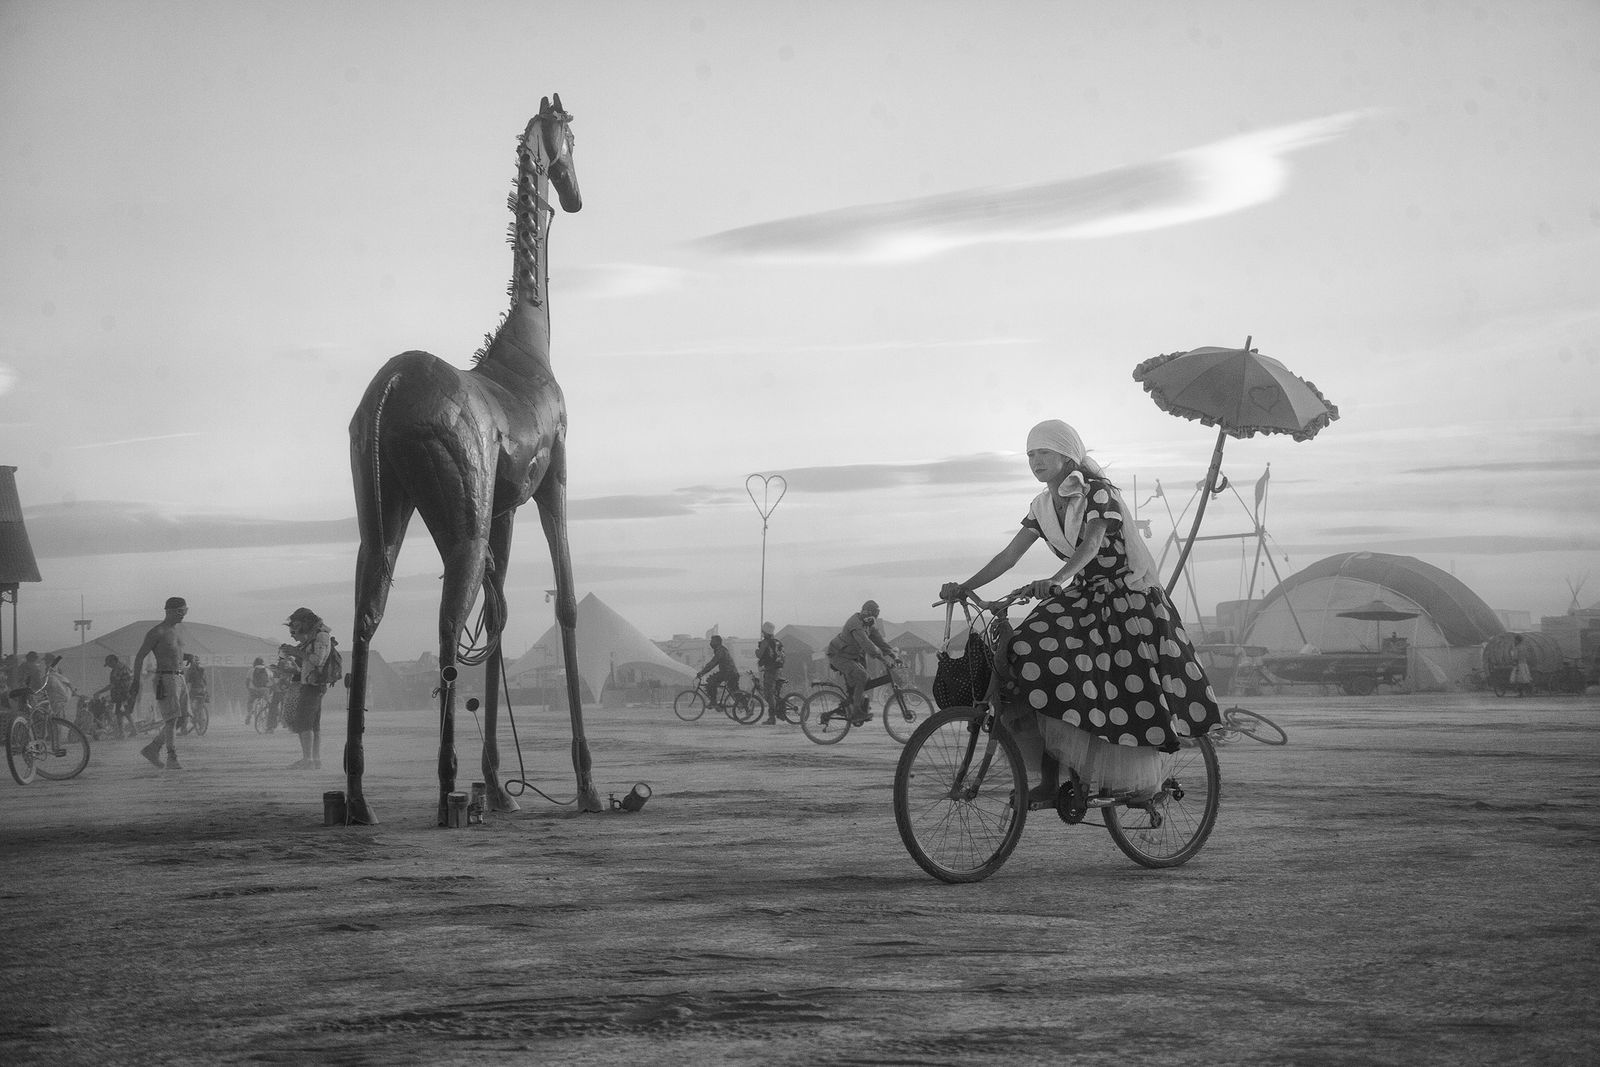 Pavel Antonov. Burning Man. City of Sand. _MG_9852-Edit copy